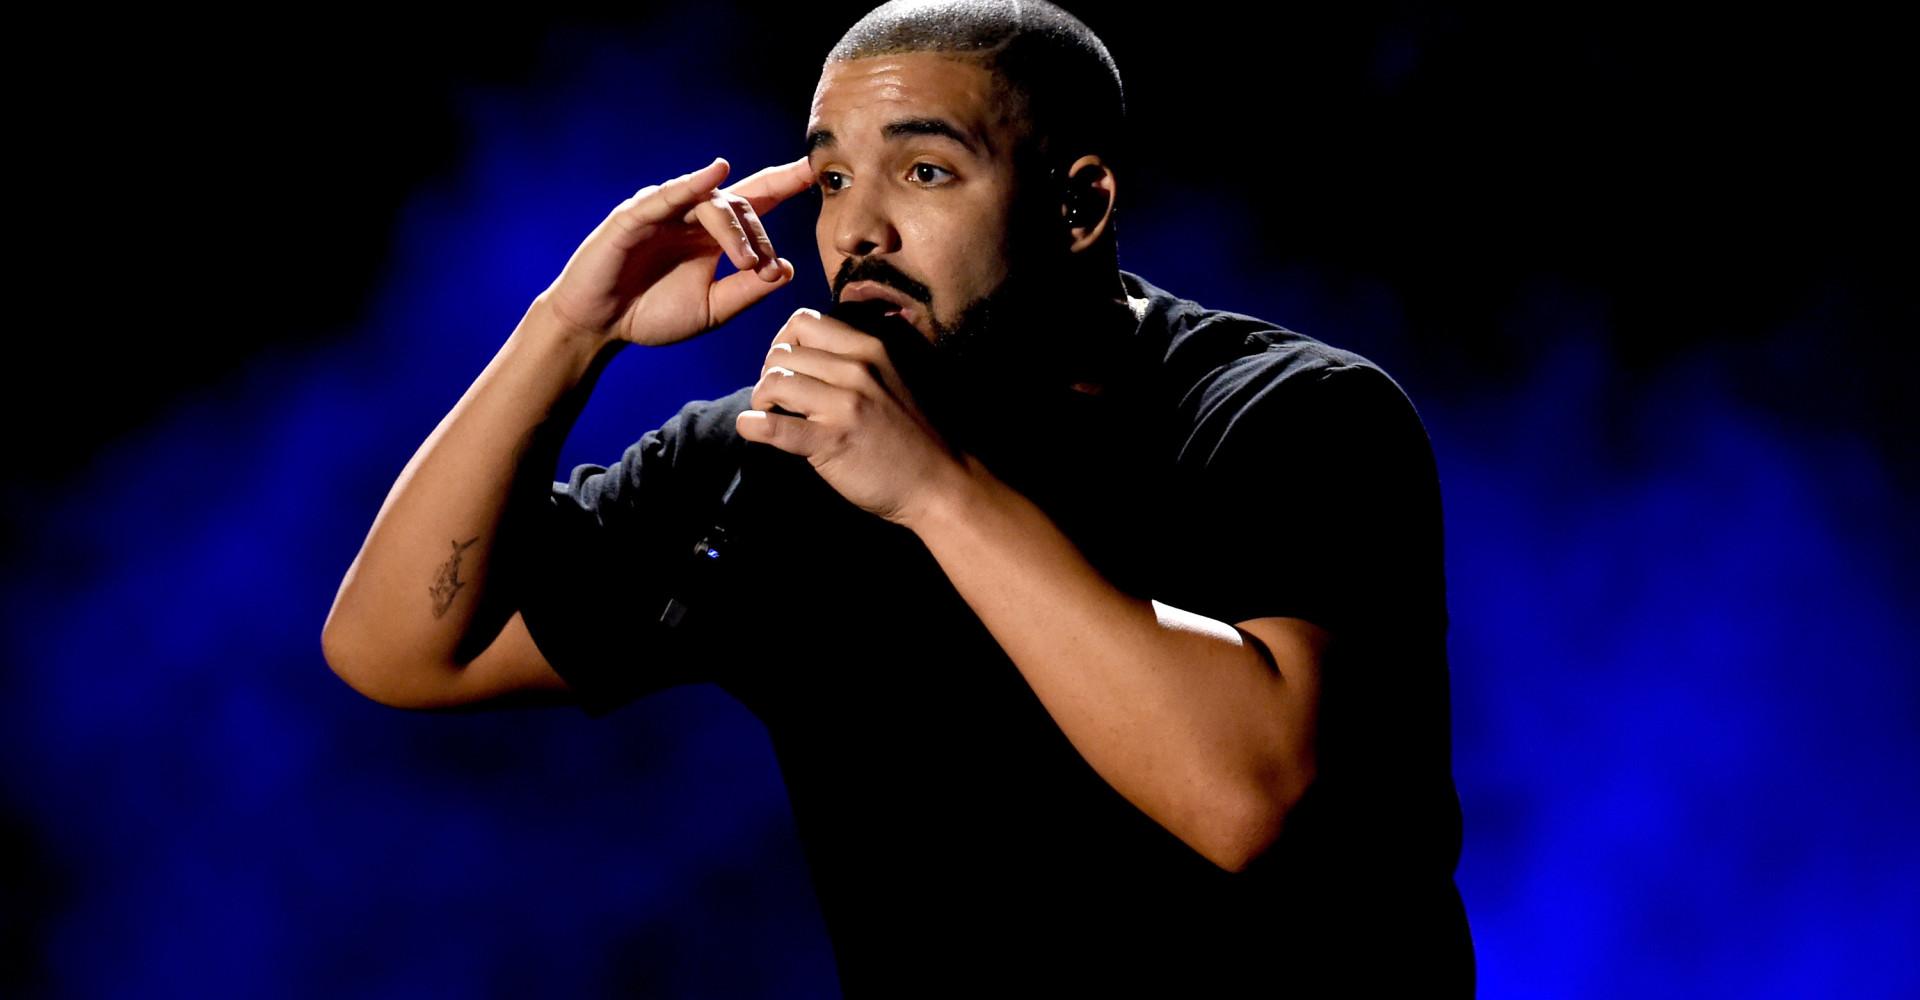 Pusha T accuses Drake of hiding his child